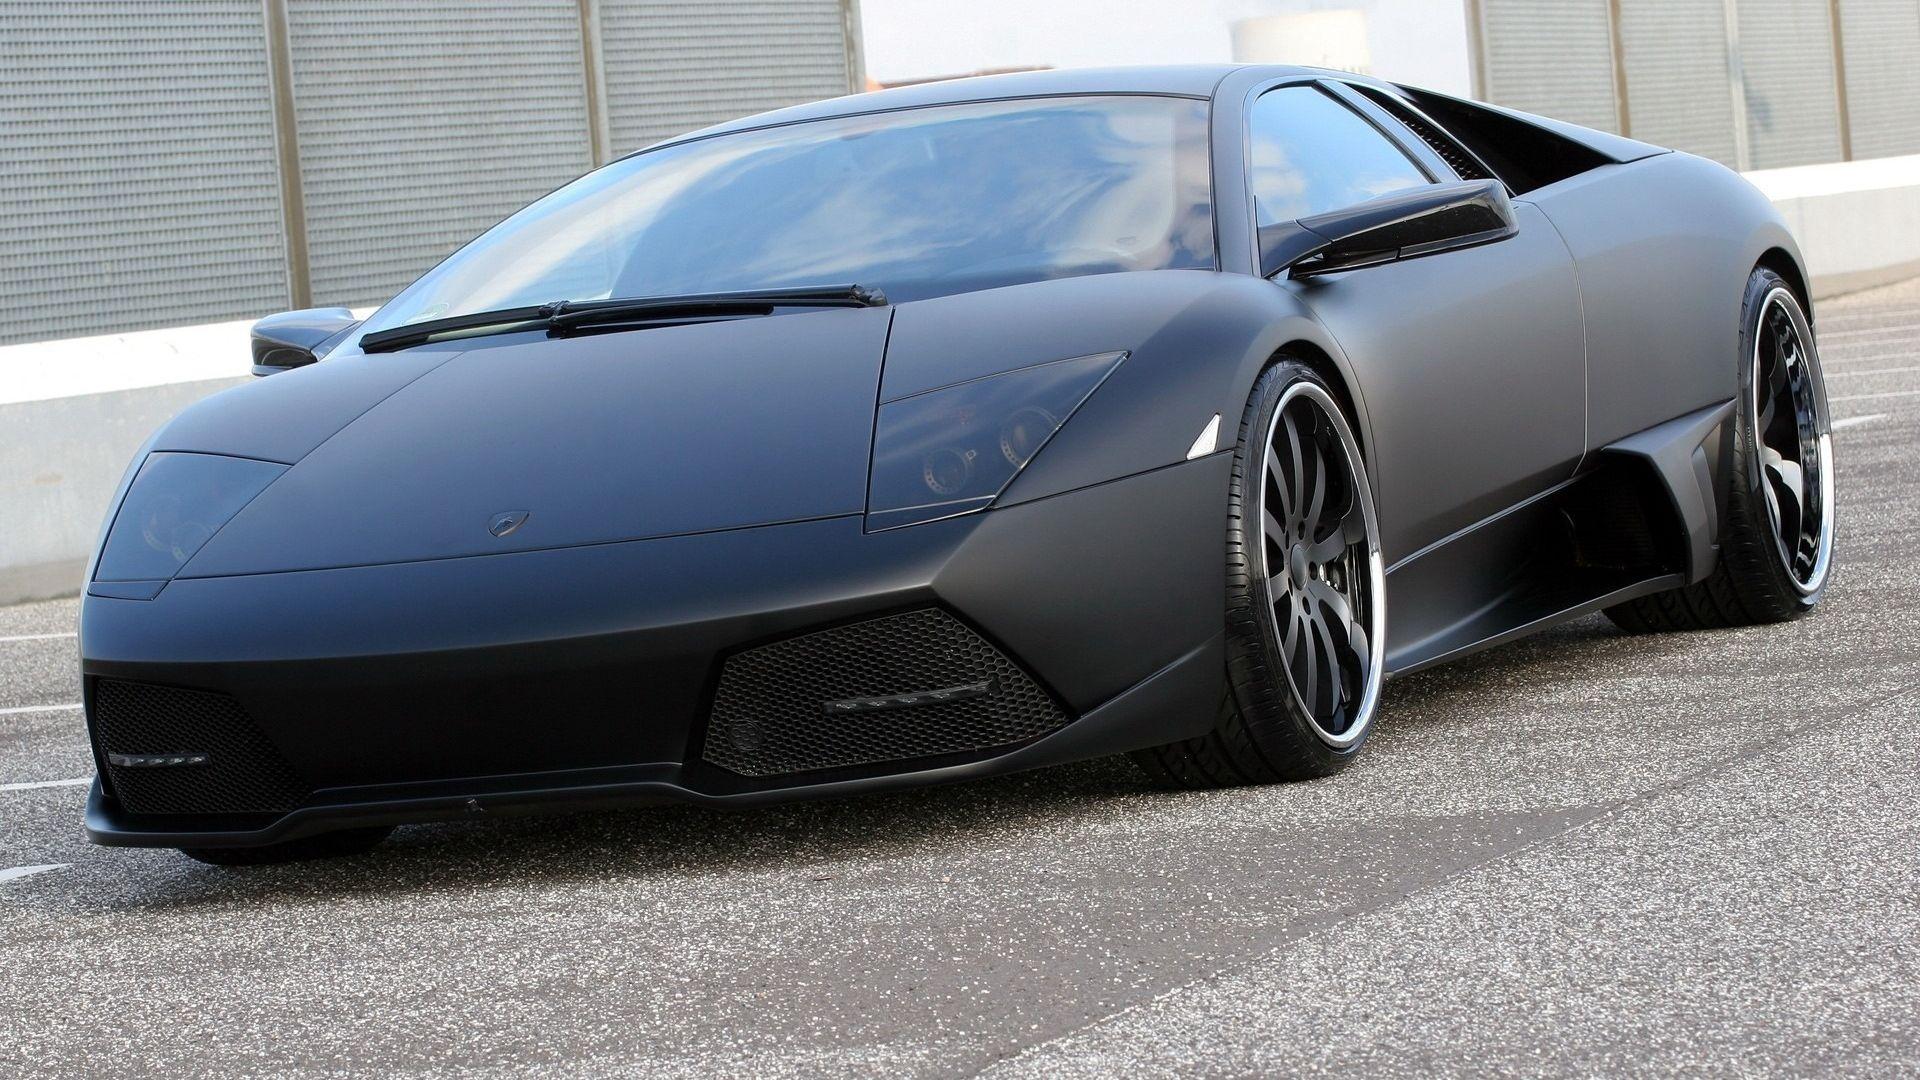 Black Luxury Vehicles: Black Matte Finish